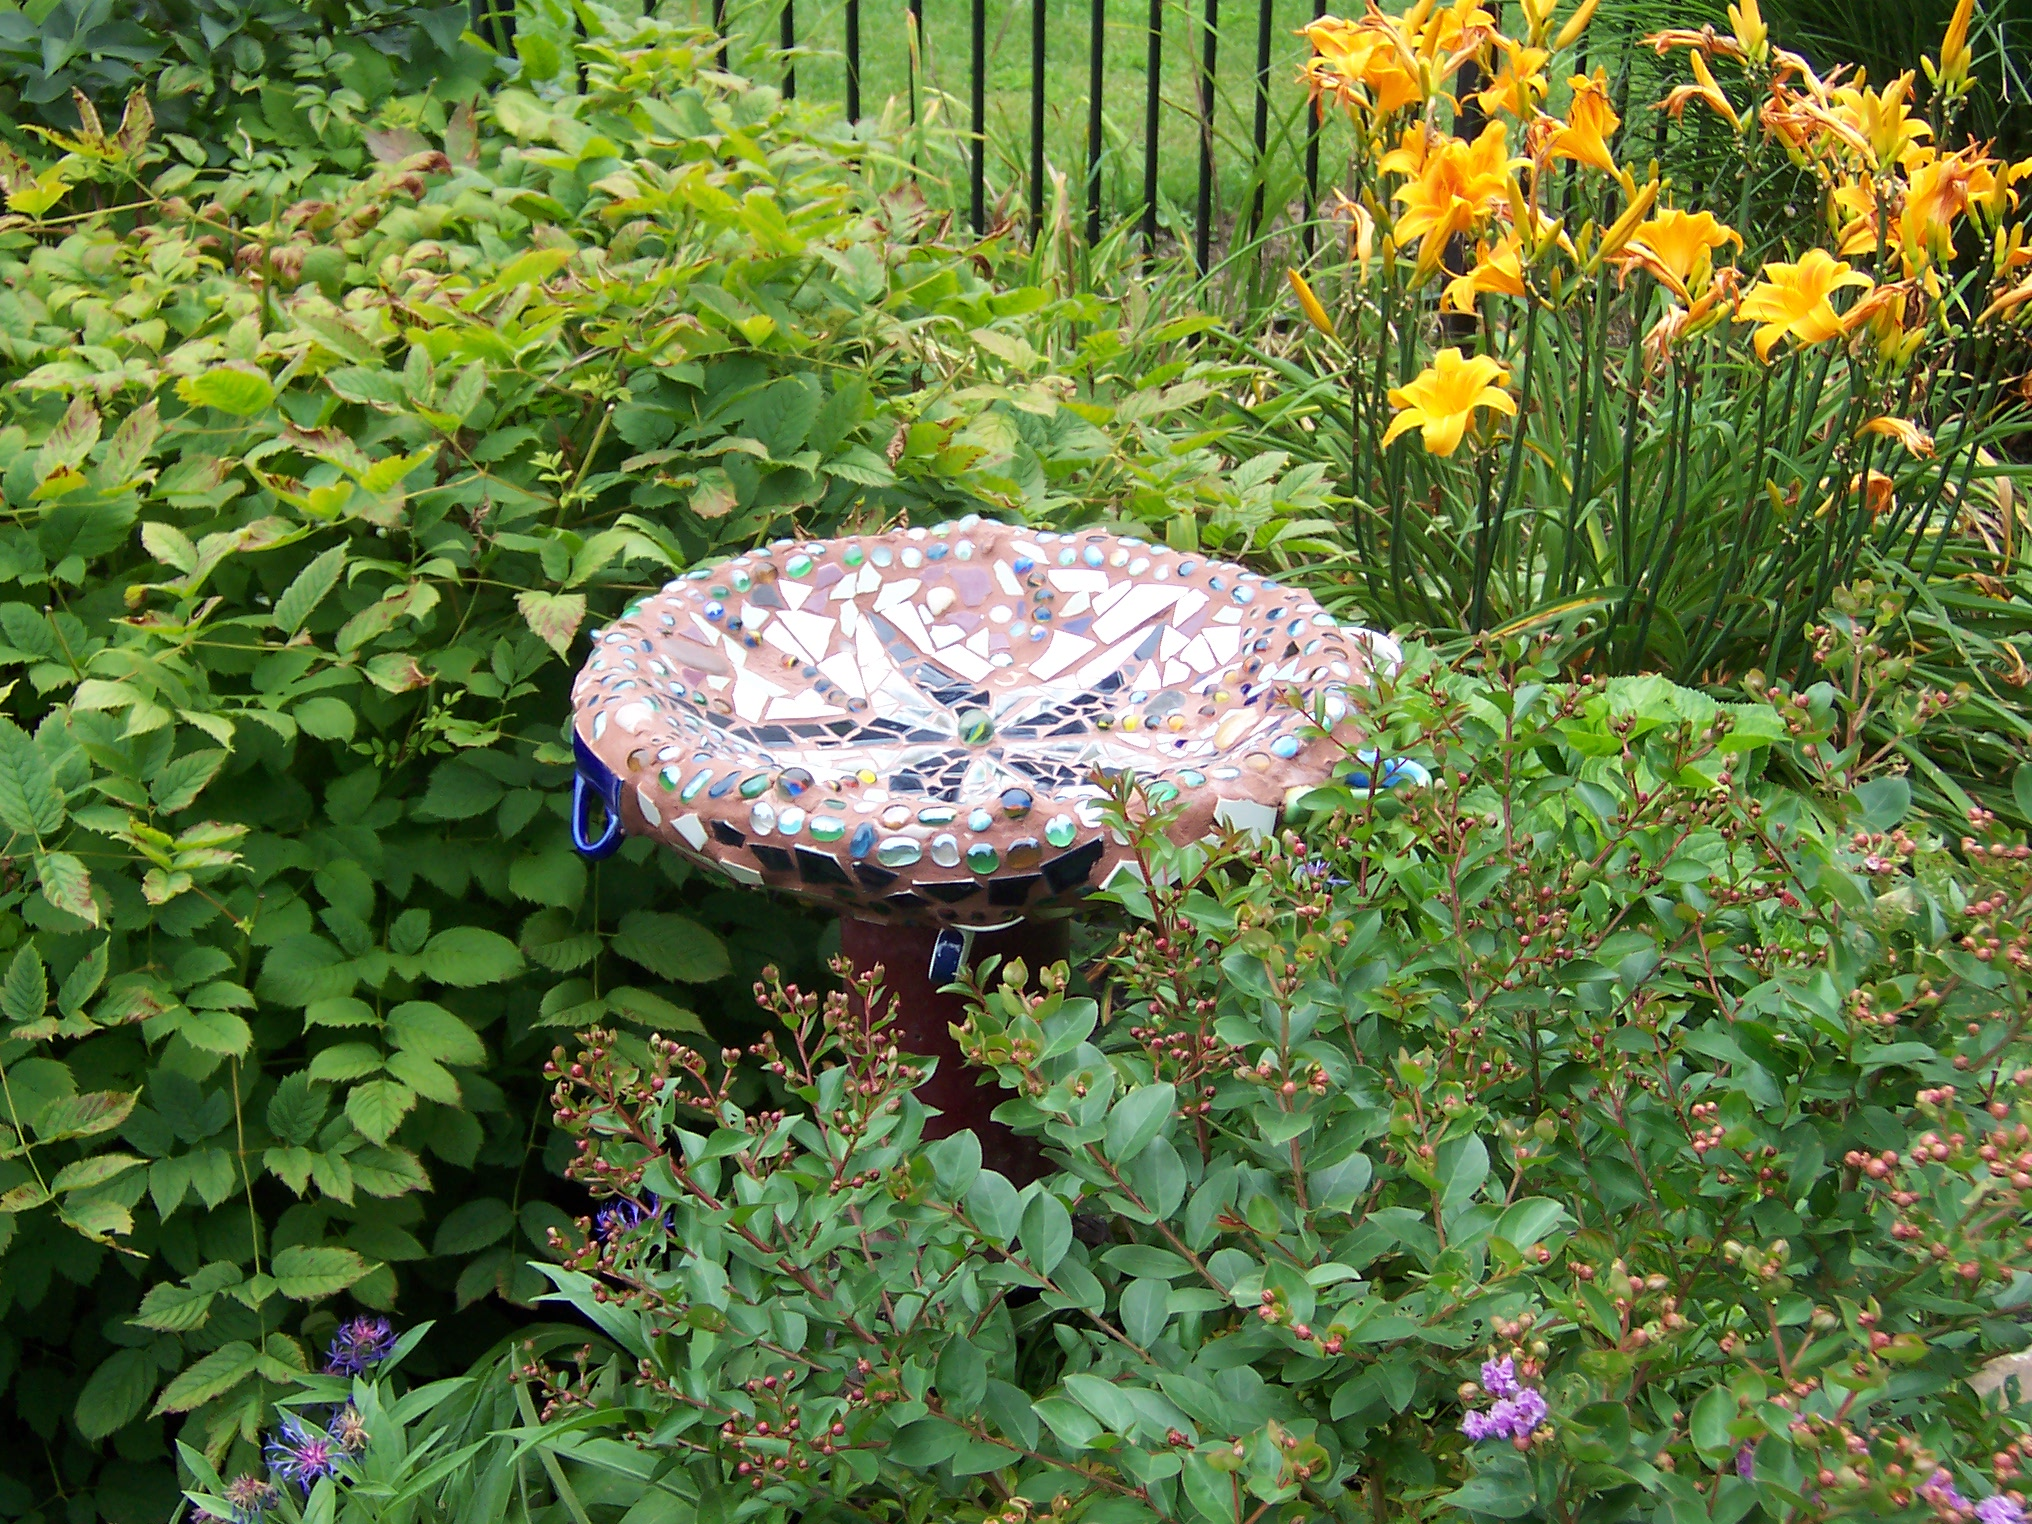 Create an Eccentric Mosaic Garden Ornament